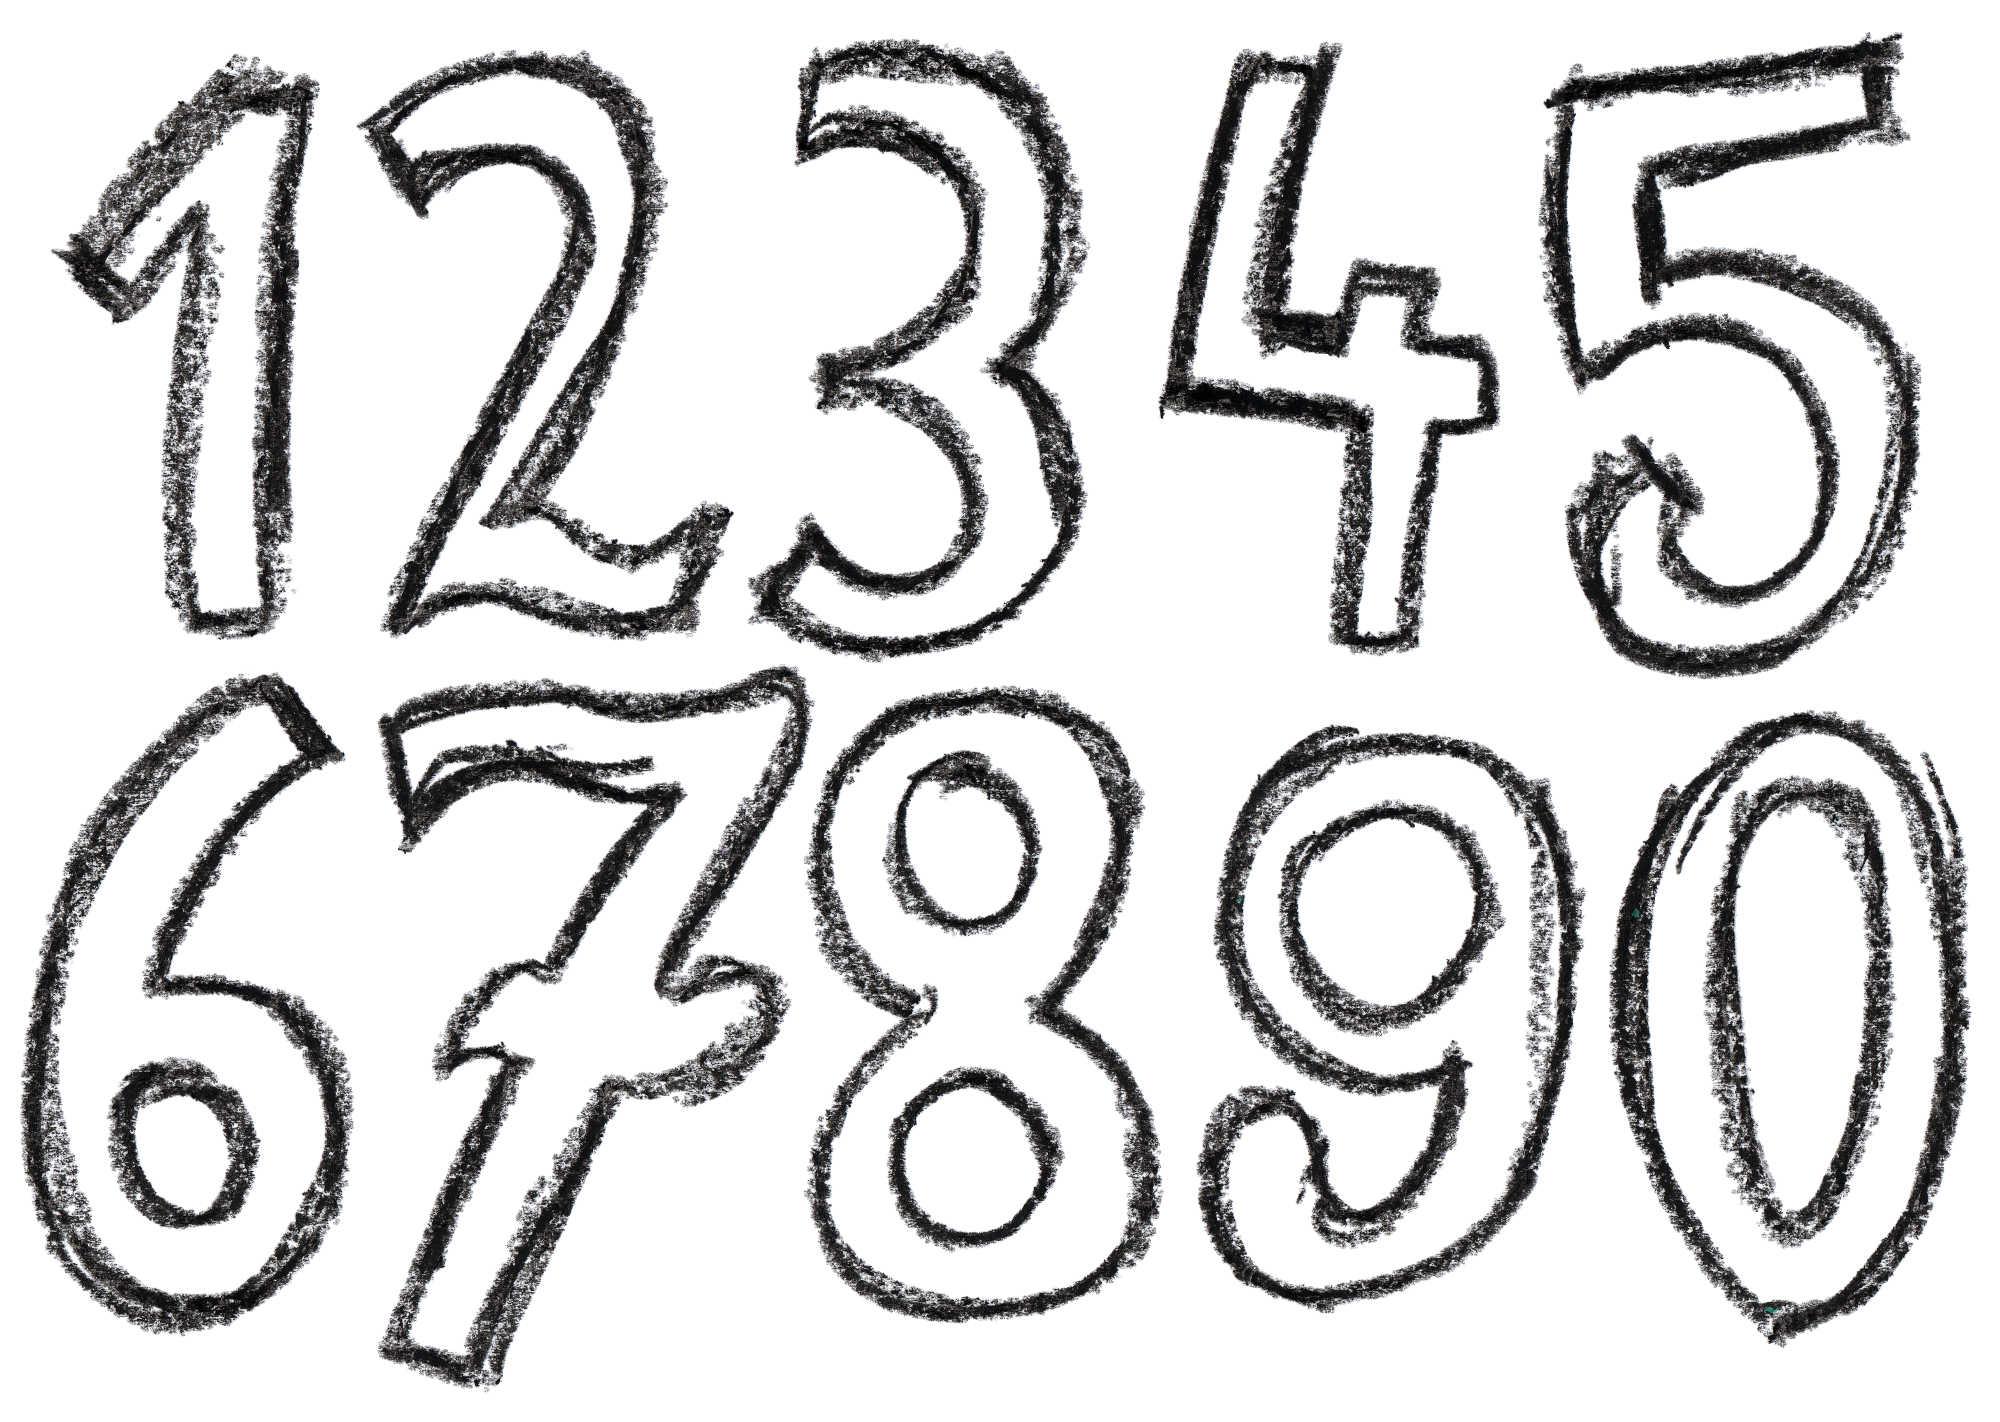 Crayon Number (PNG Transparent) | OnlyGFX.com